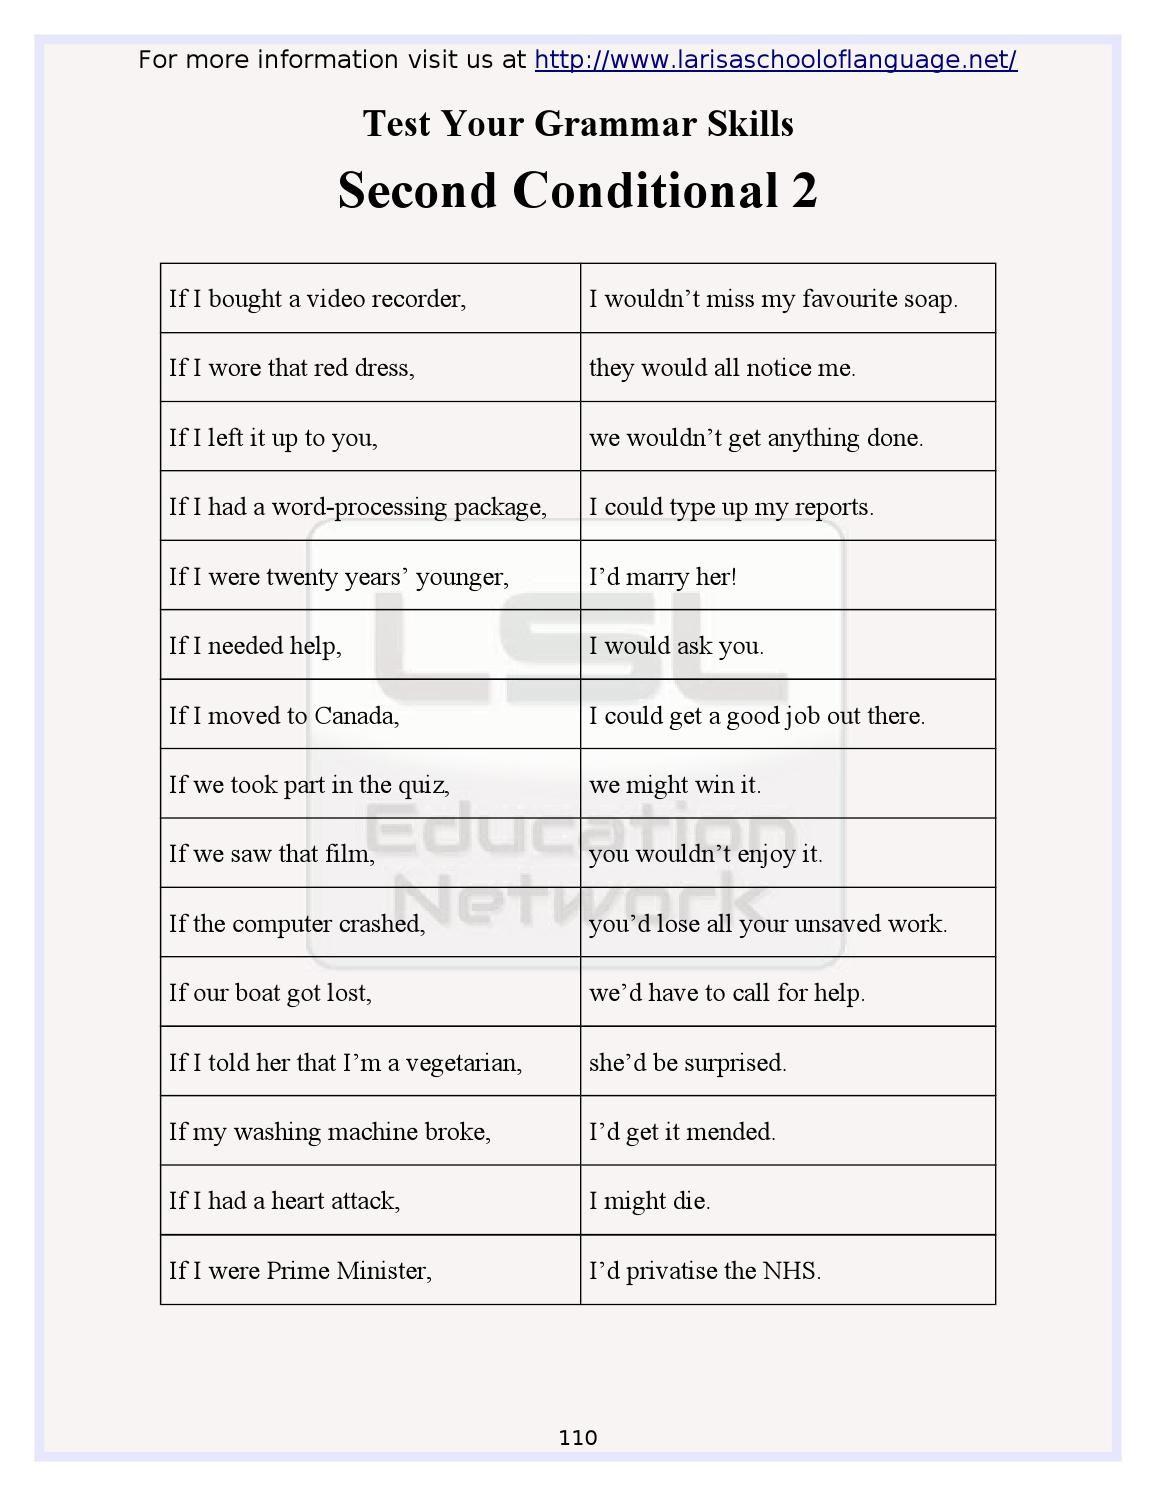 101 English Grammar Worksheets For English Learners Grammar Worksheets English Grammar Worksheets English Grammar [ 1496 x 1156 Pixel ]